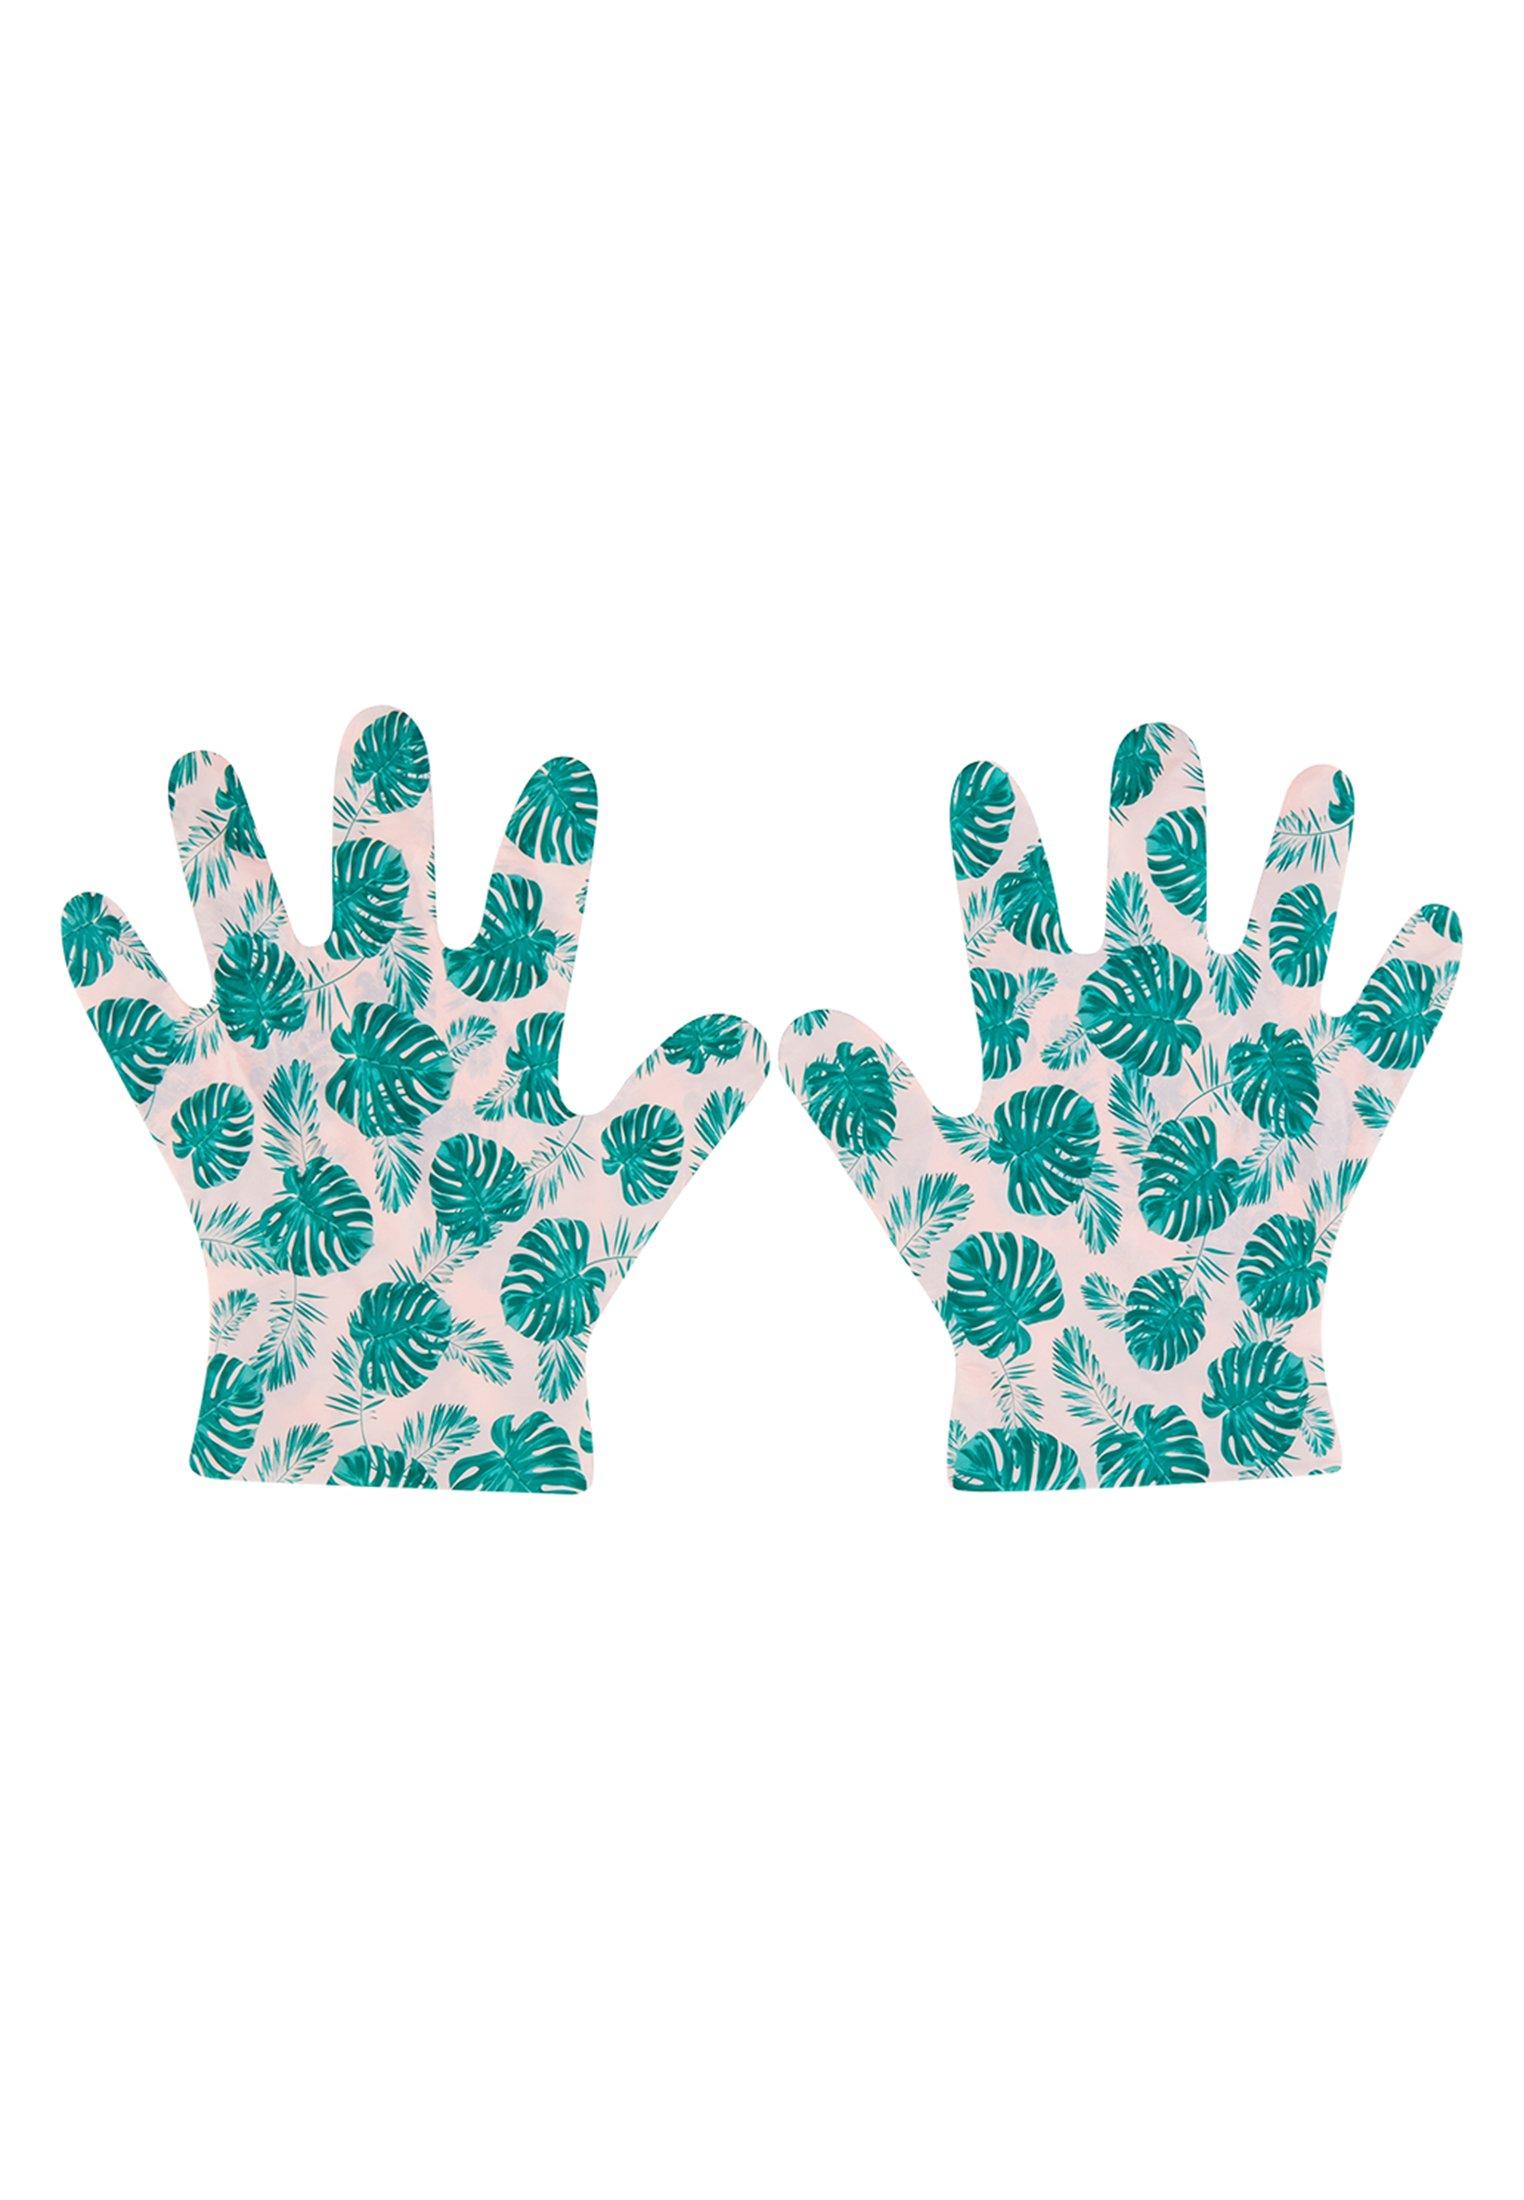 Nails Inc THIRSTY NAILS HAND MASK - Håndmaske - 10480